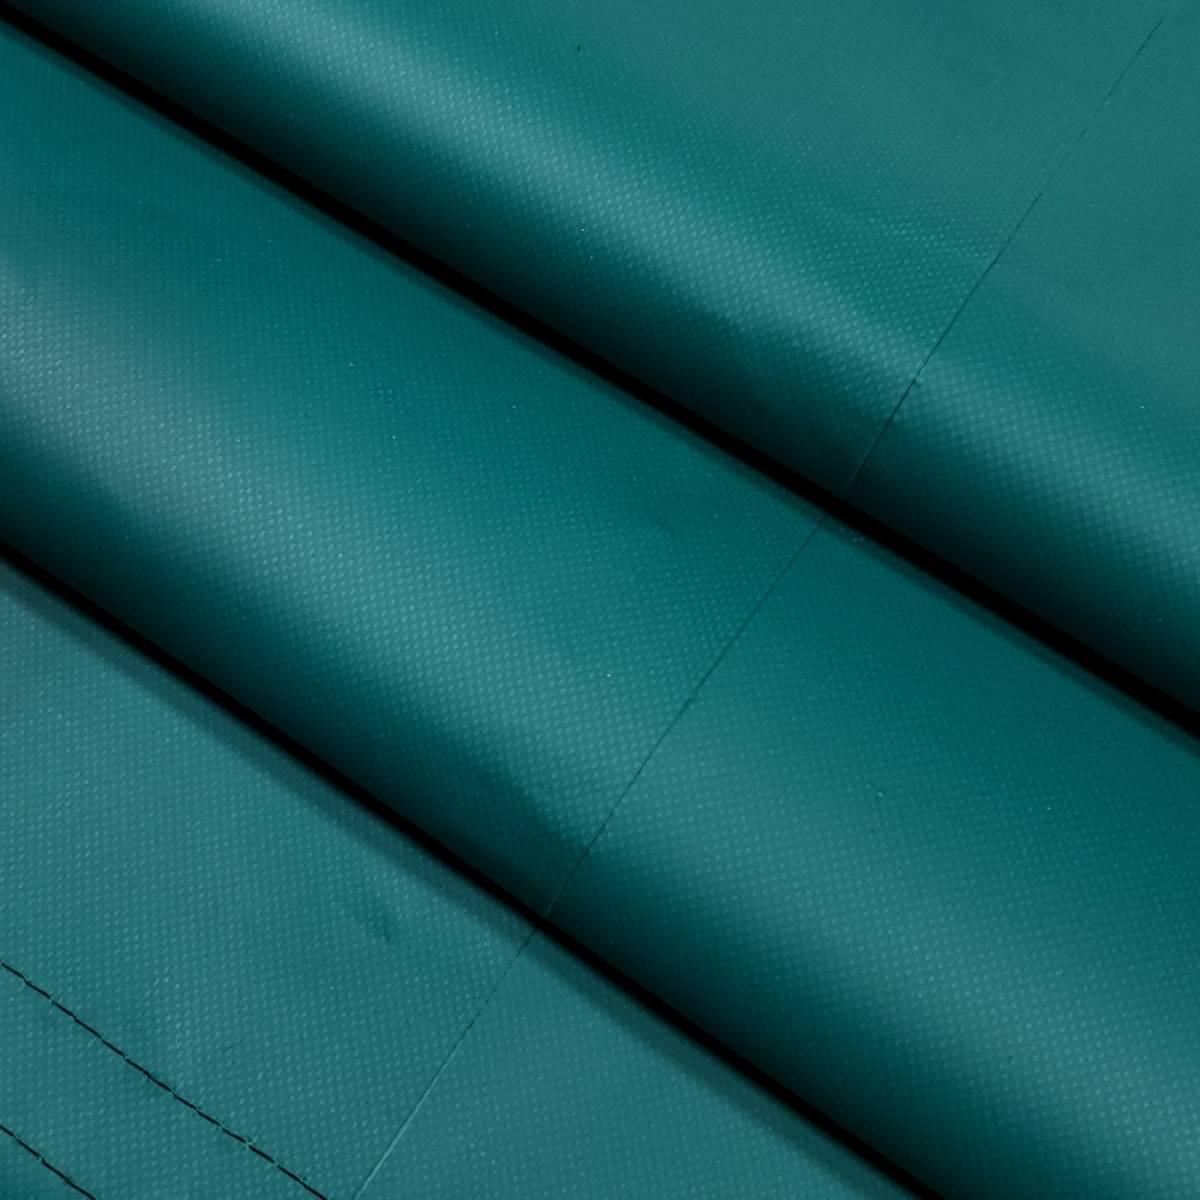 Custom Industrial Curtain Divider Tarp Cover 14oz Solid